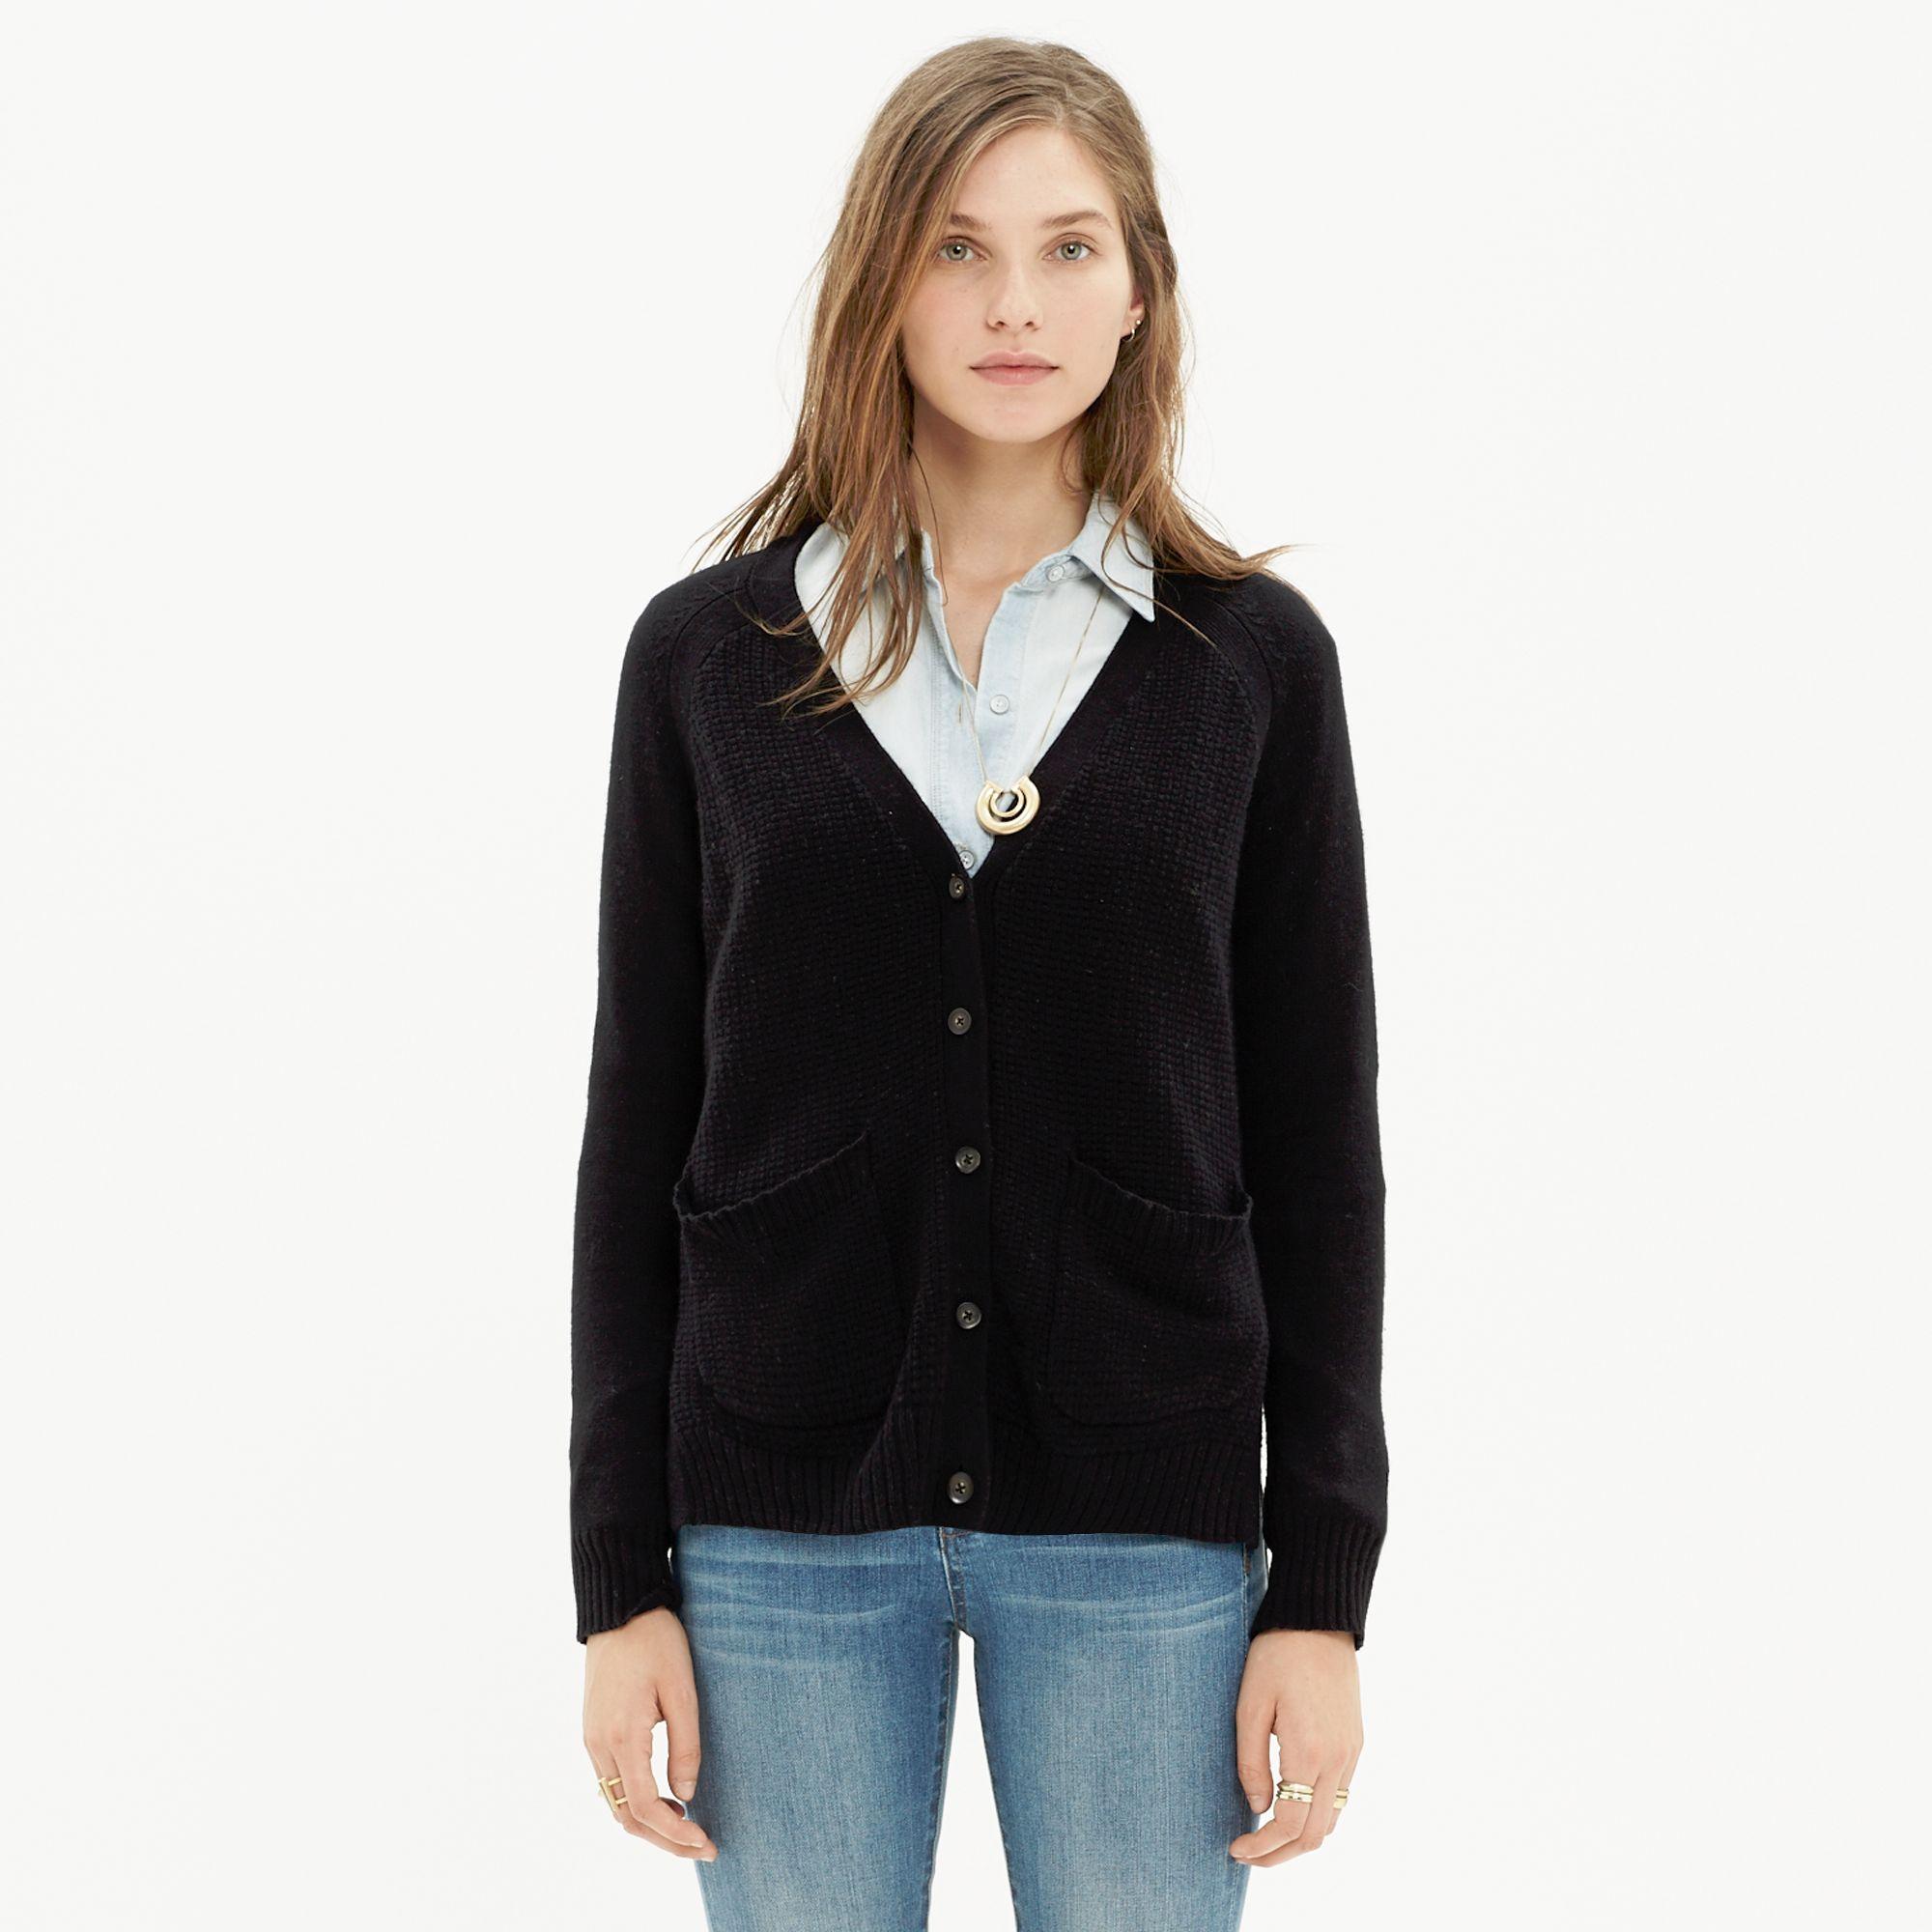 Madewell Texturework Cardigan in Black | Lyst